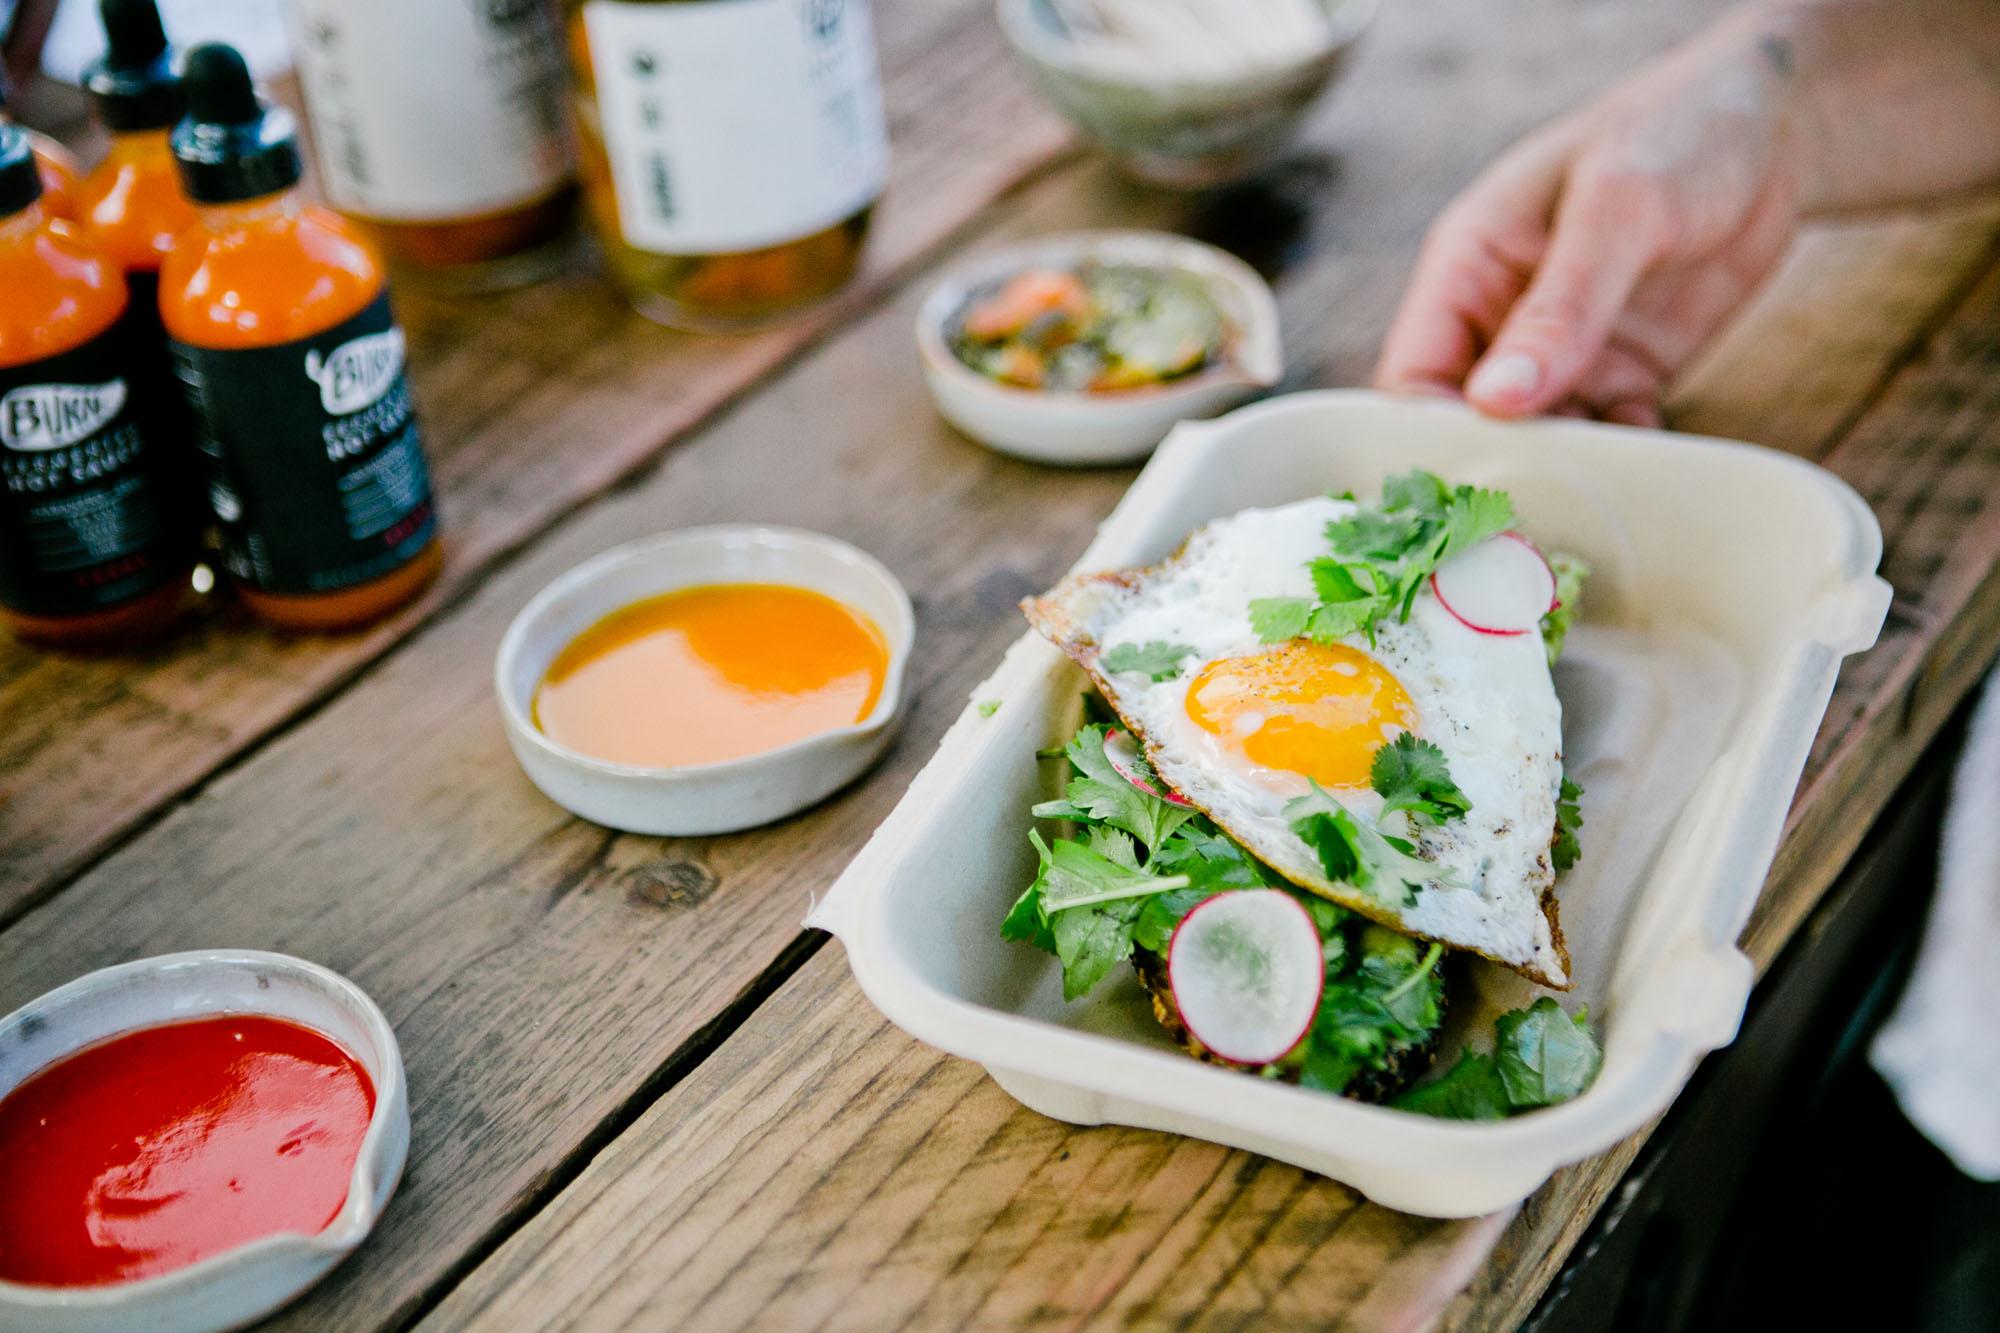 avocado_egg_breakfast_toast_hot_sauce.jpg